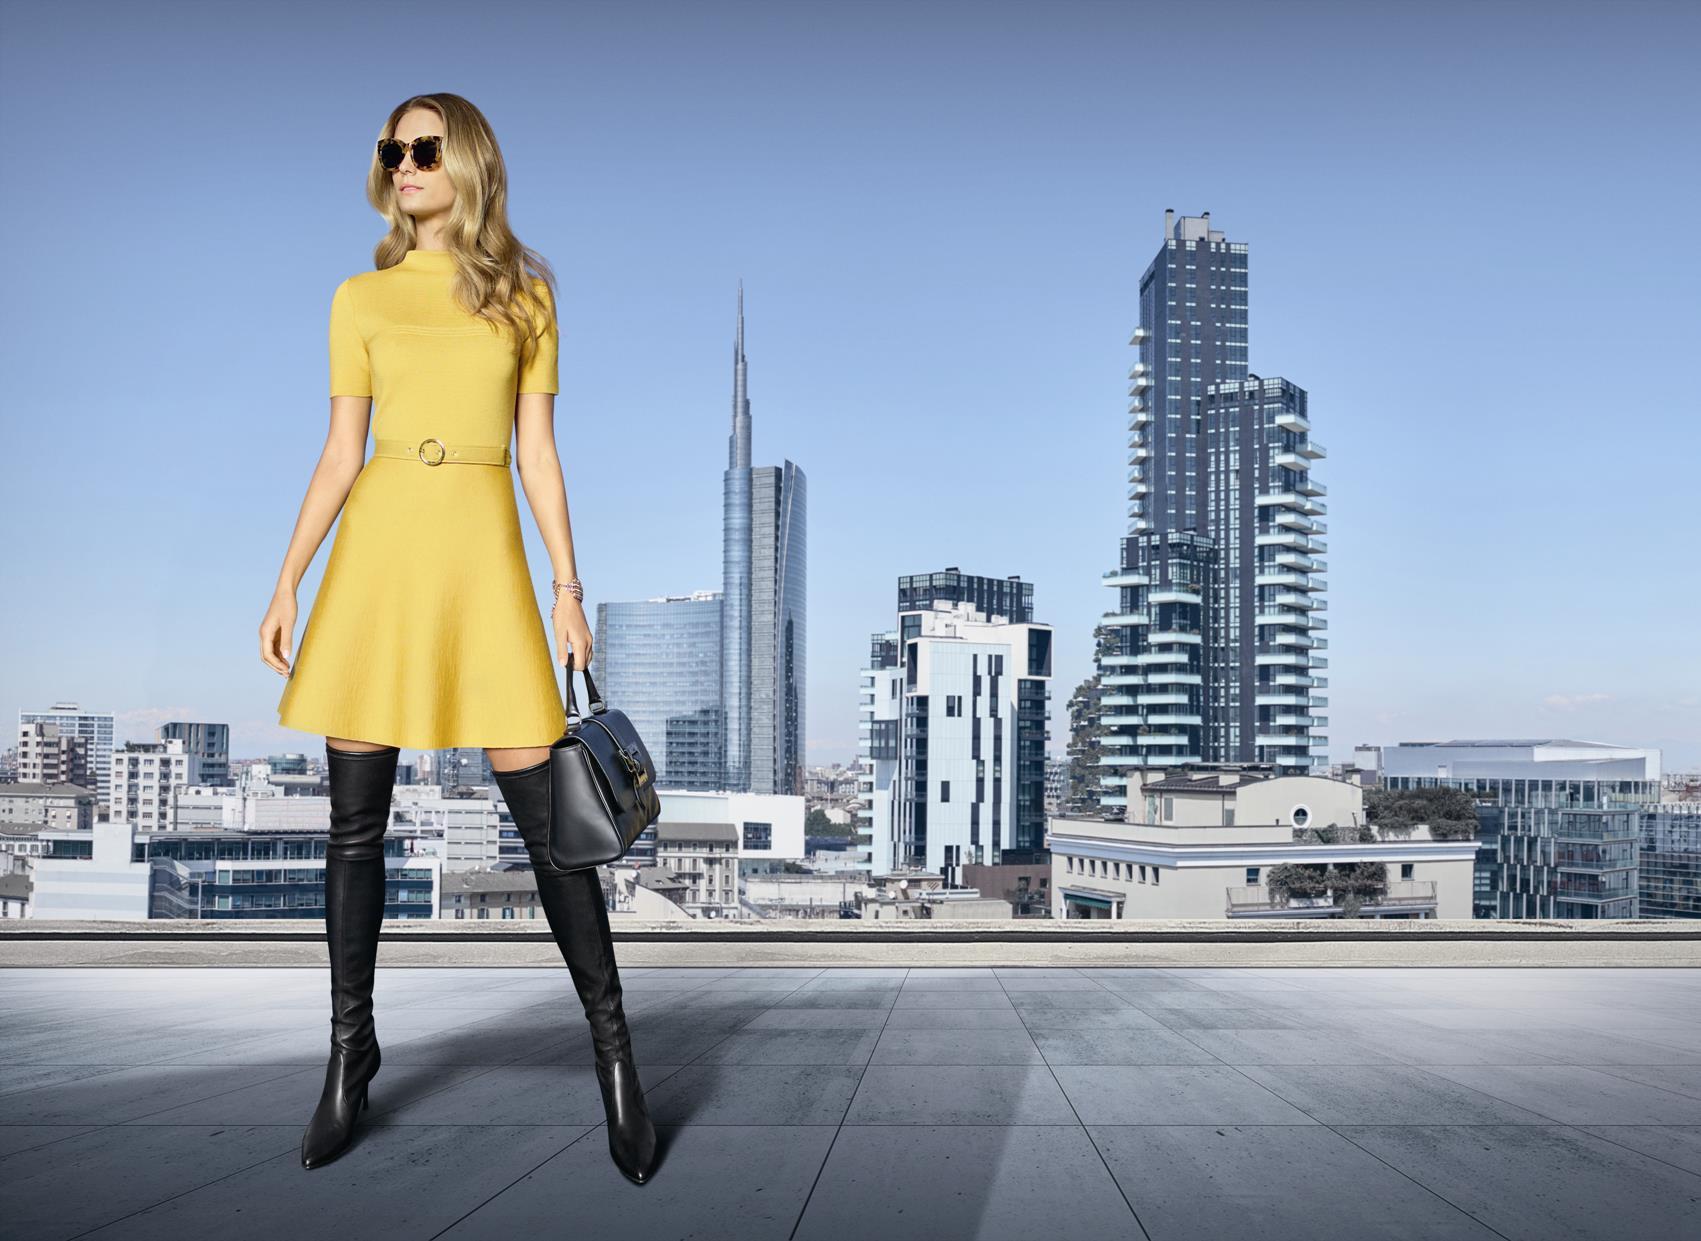 Kate Middleton's most memorable fashion moments as Luisa spagnoli fashion show